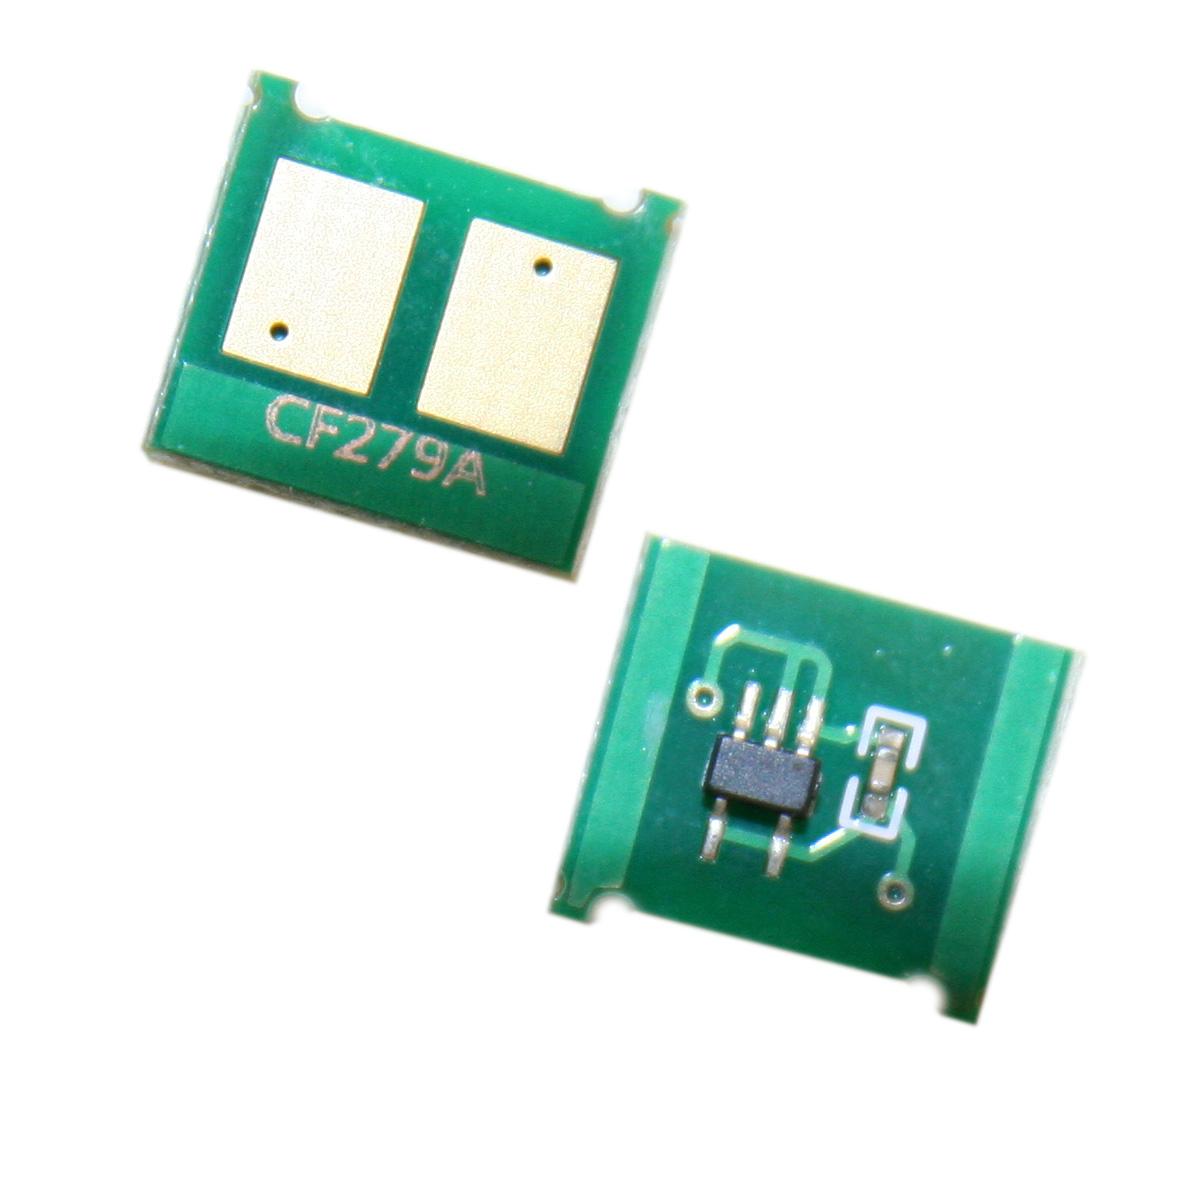 CHIP HP CF279A 1K